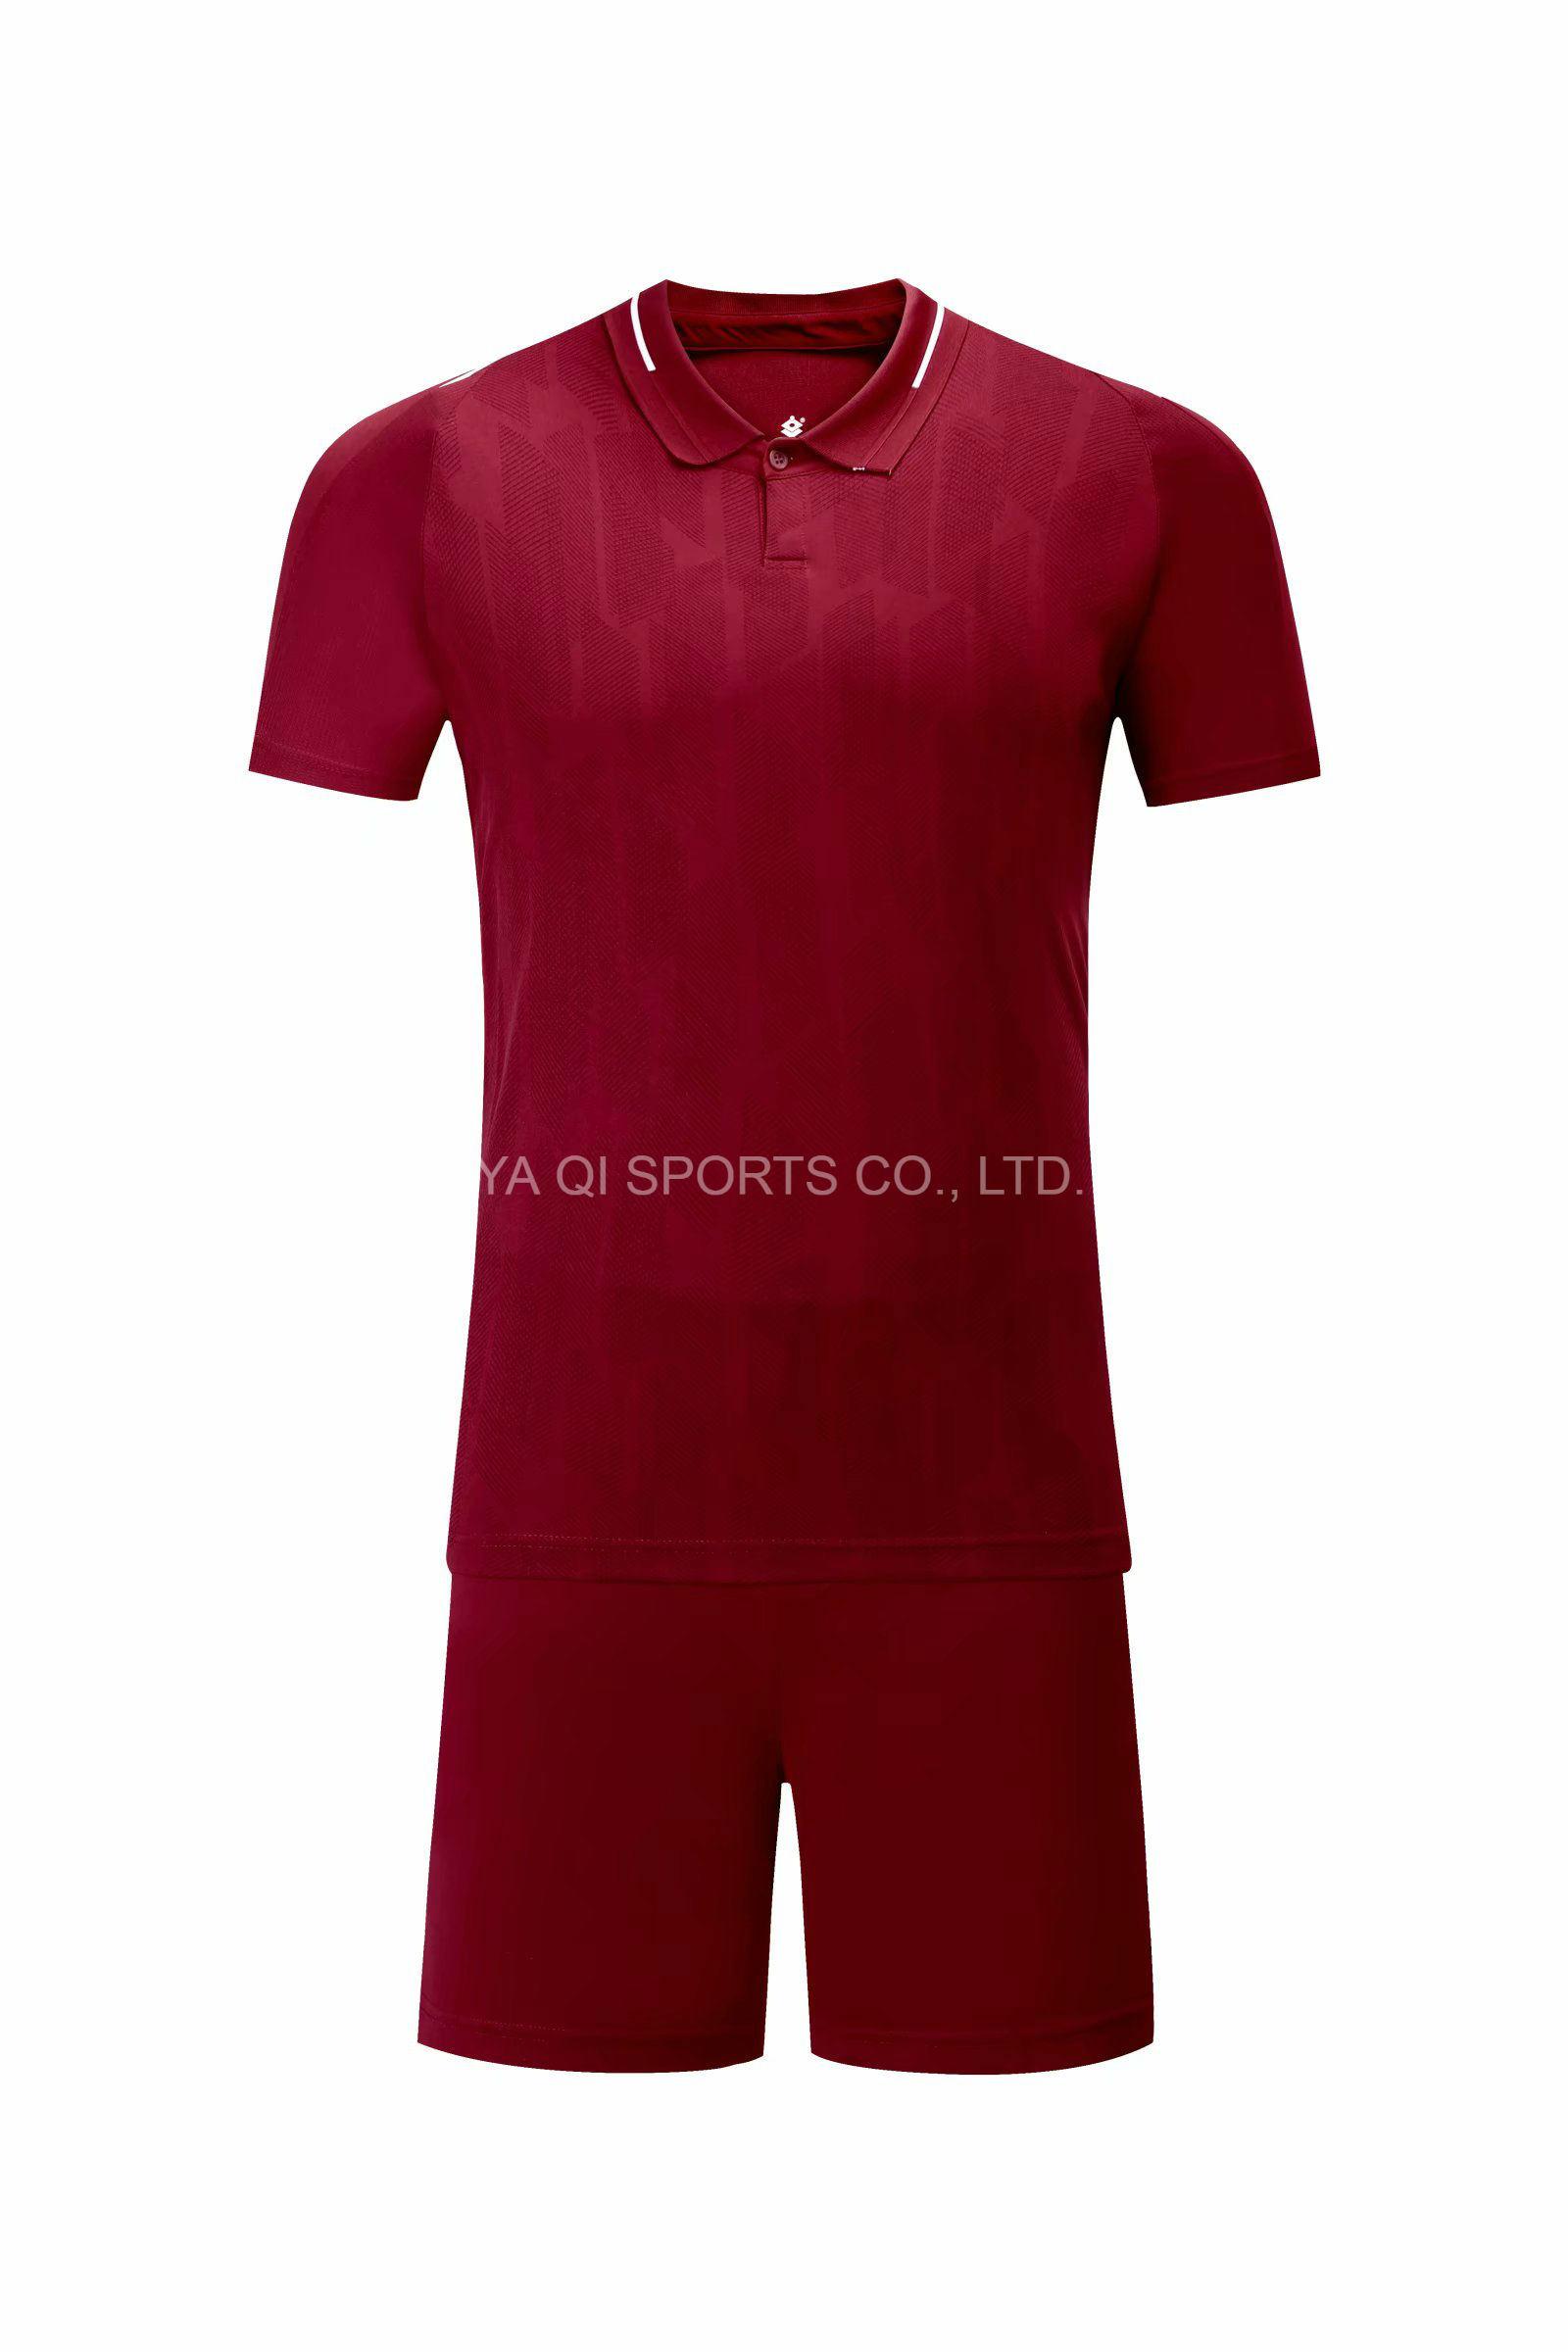 China Thai Quality 2018 19 Soccer Jersey Football Shirt Design